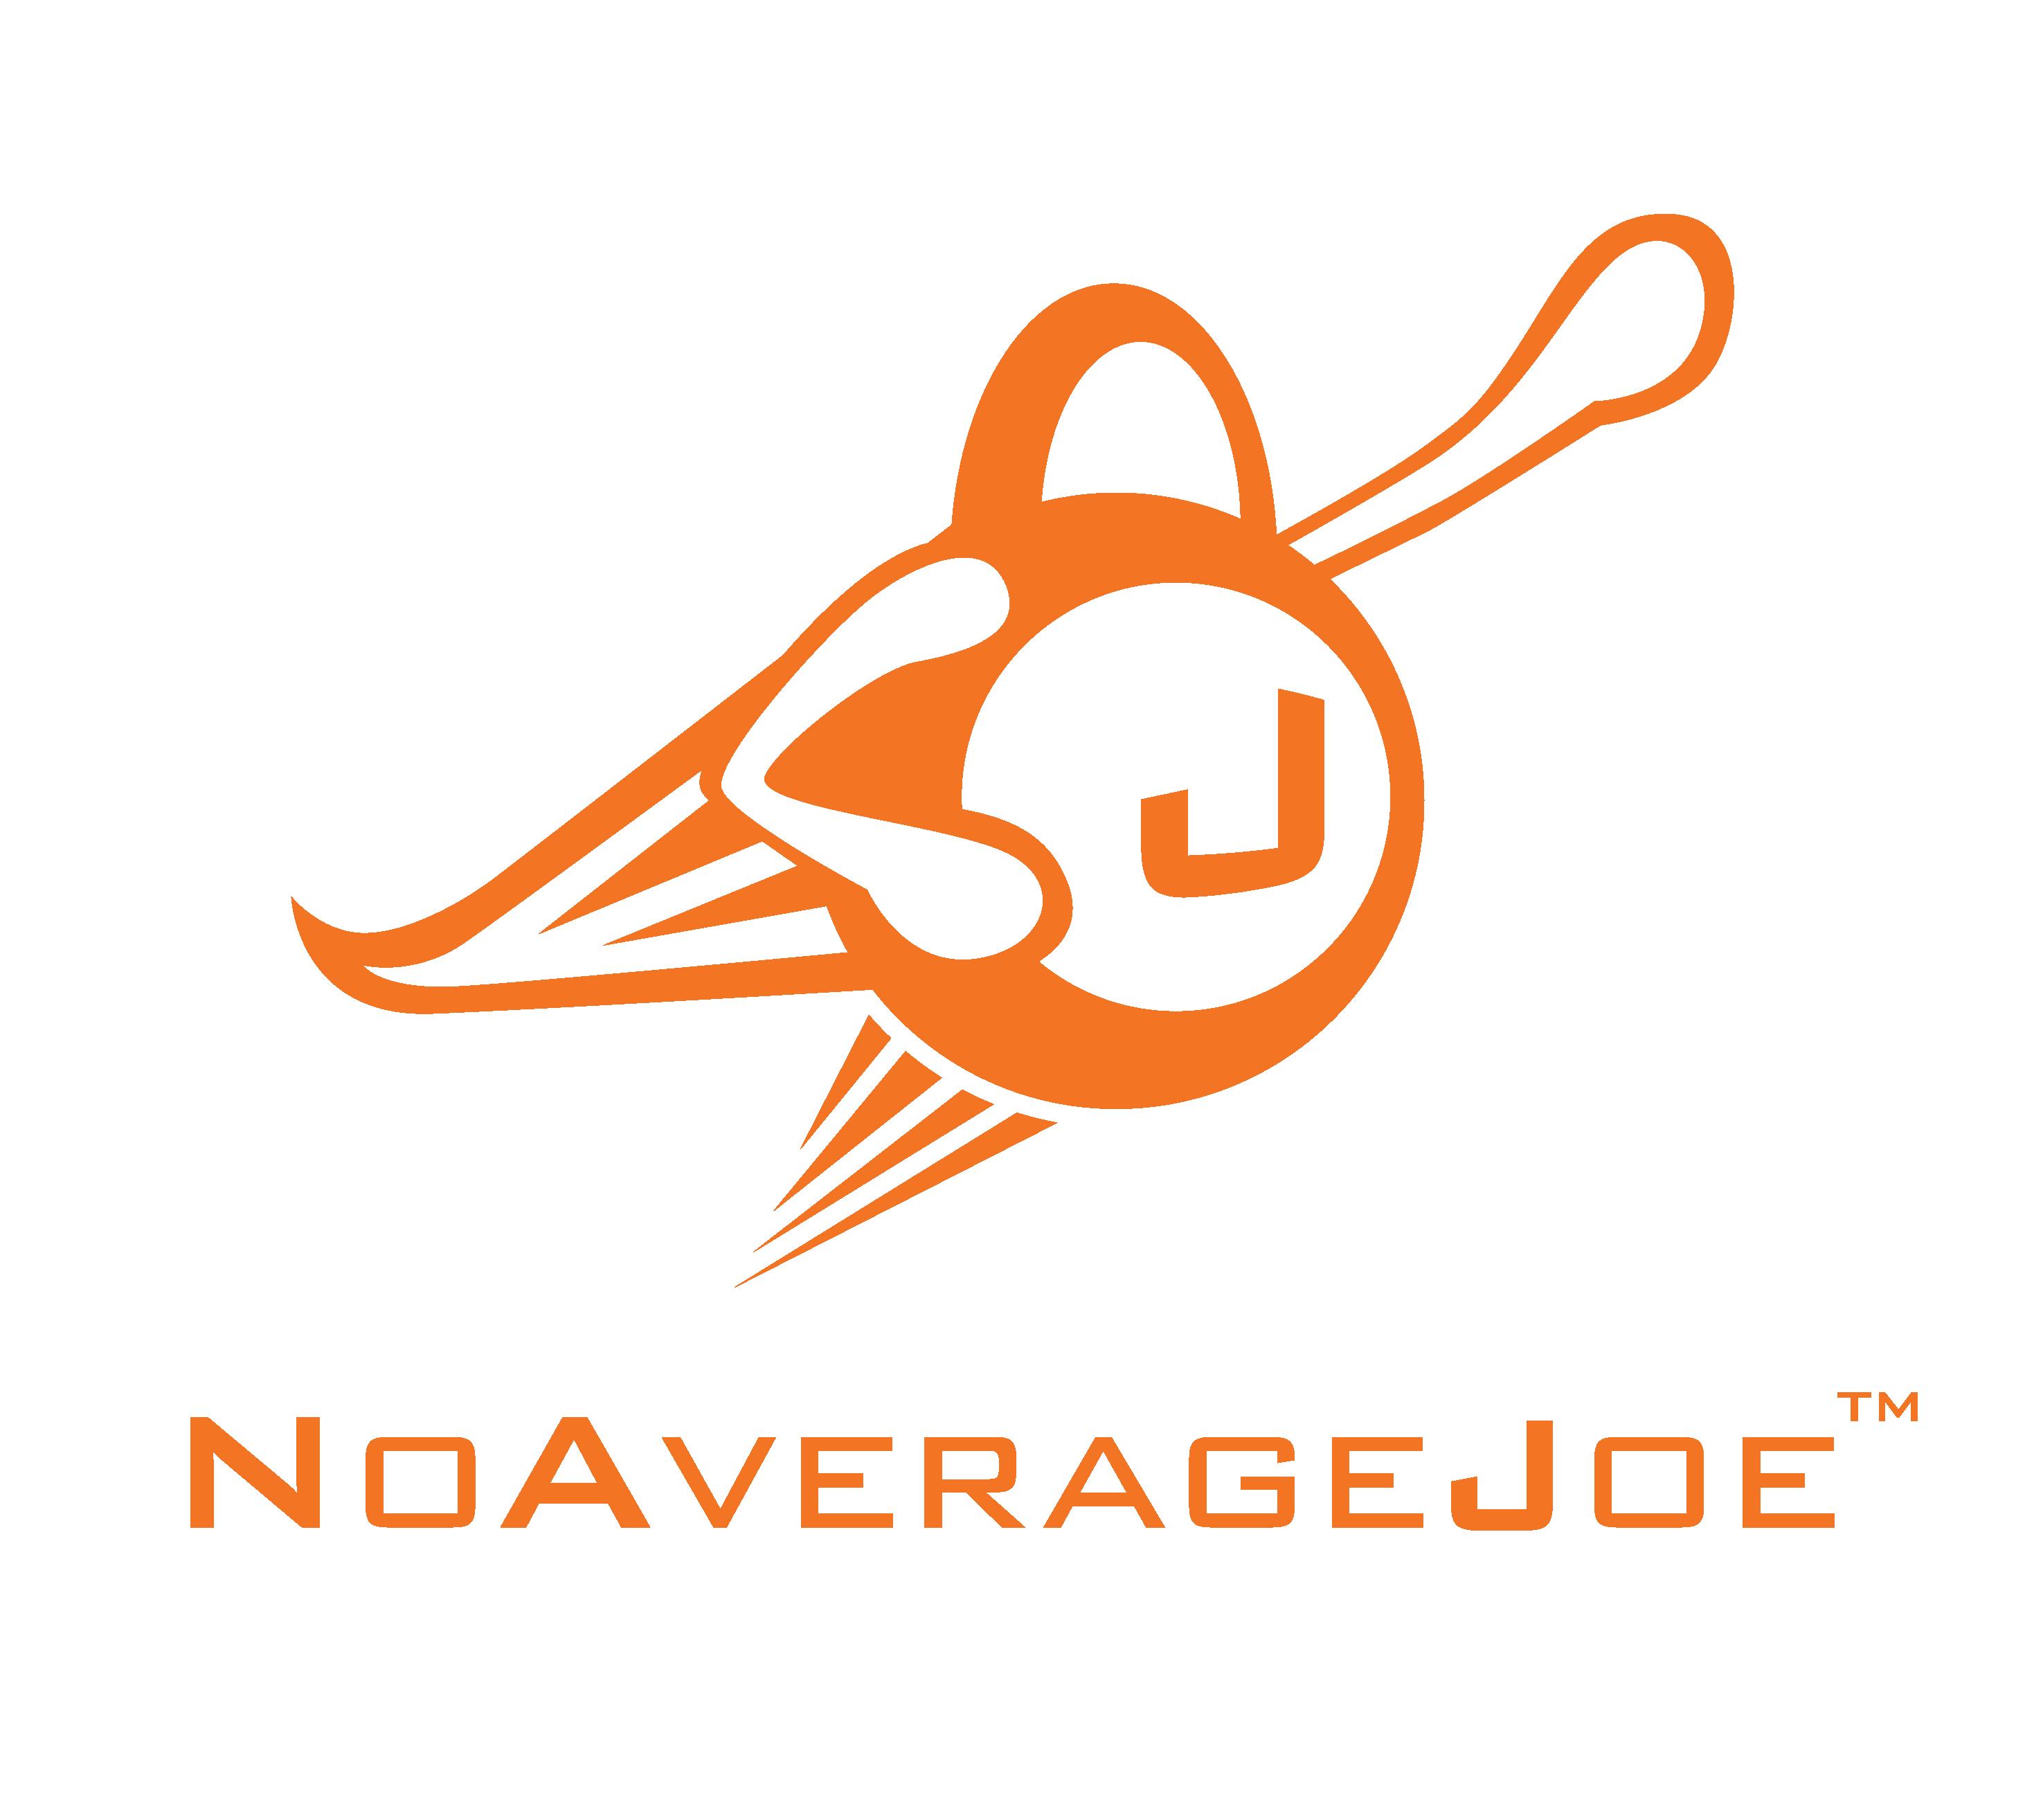 No Average Joe